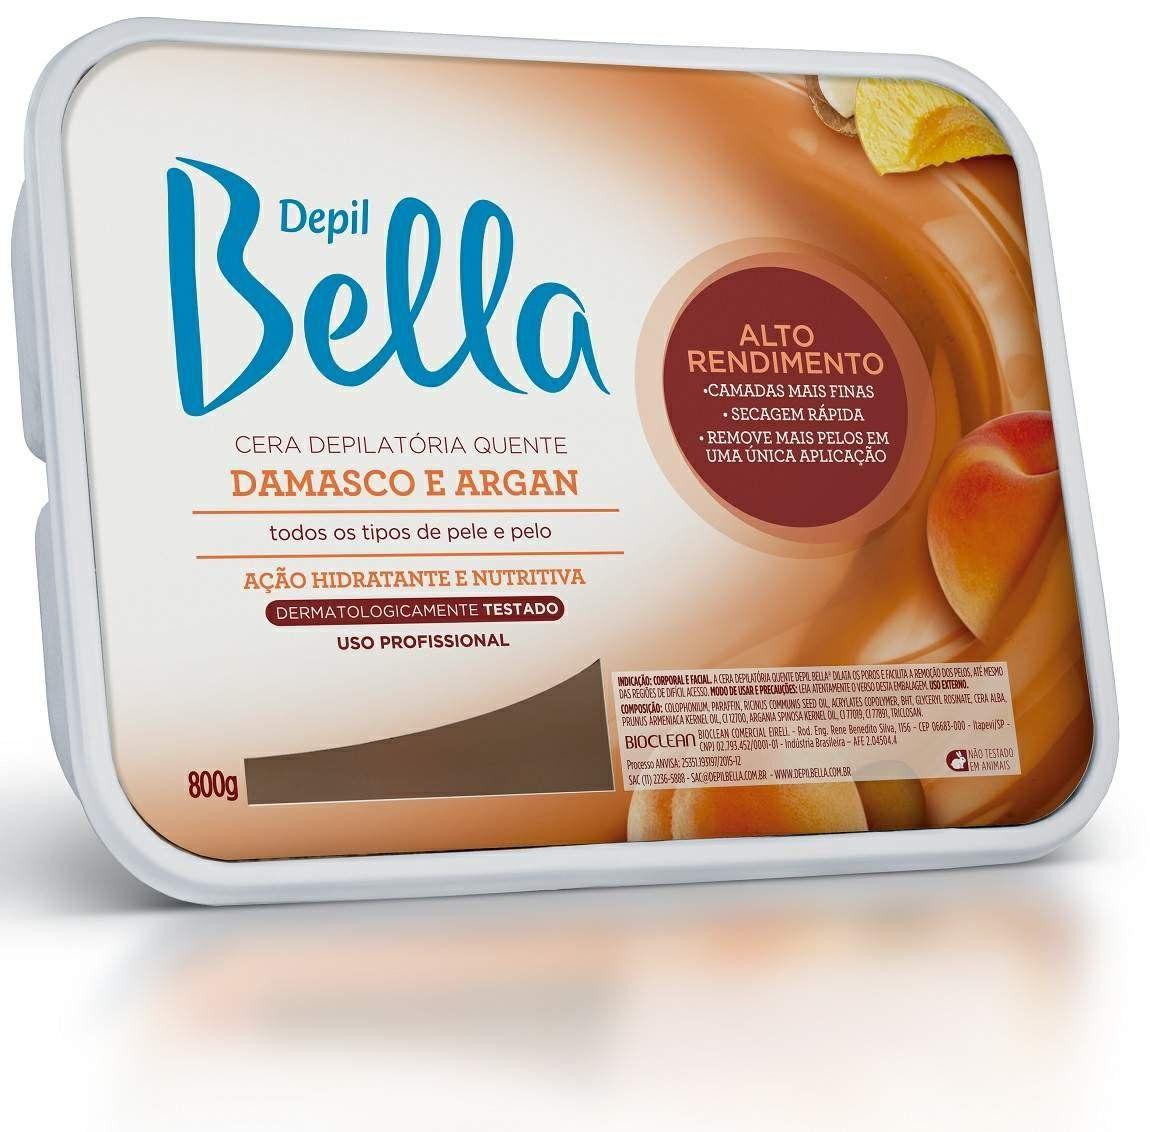 Cera depilatória oleo de argán 800g - Depil Bella